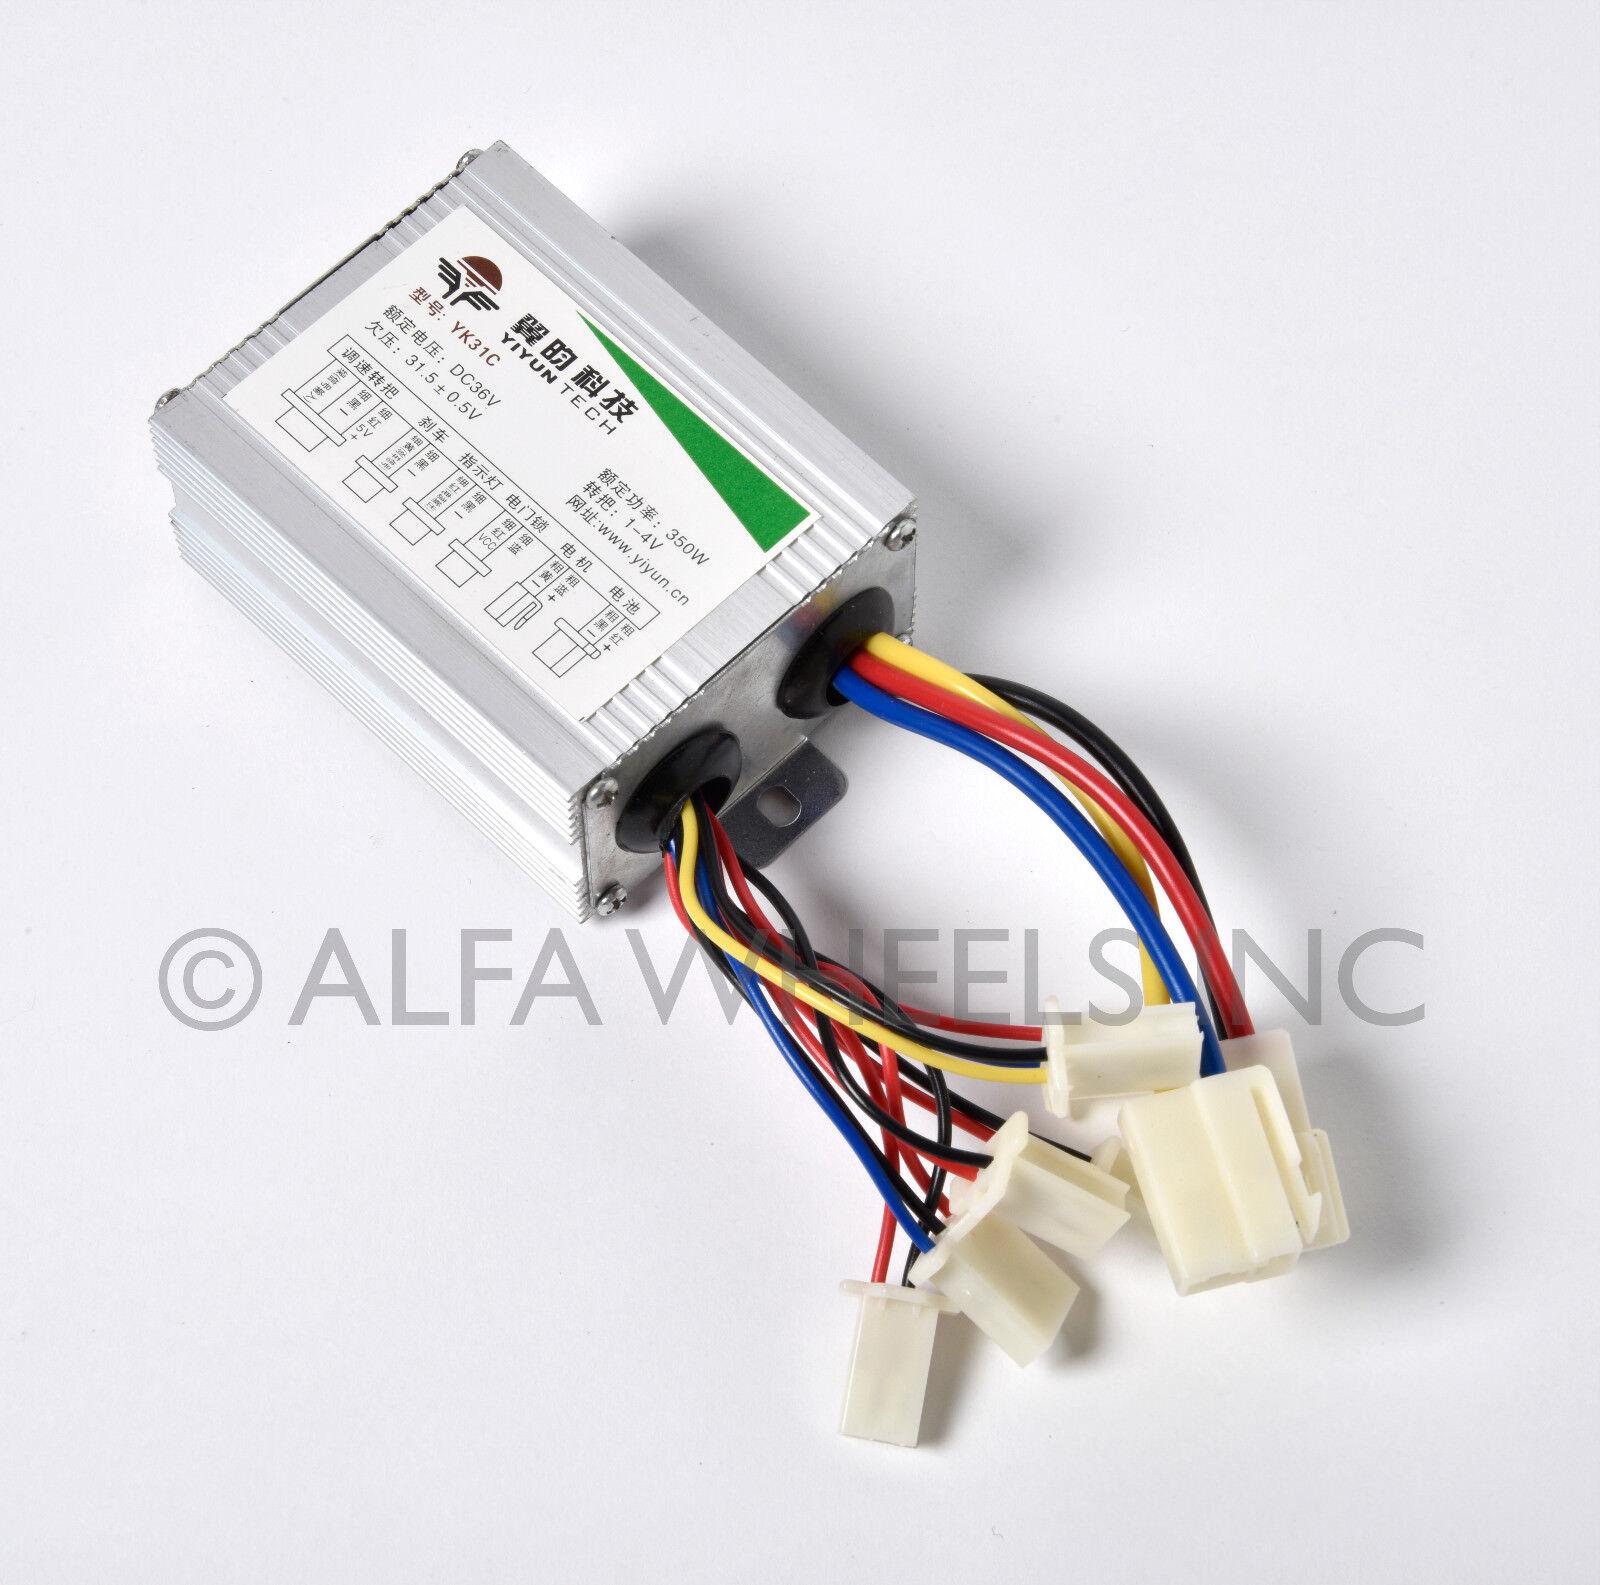 350W 36V DC electric motor Controller box f GoKart w DPDT reversing switch